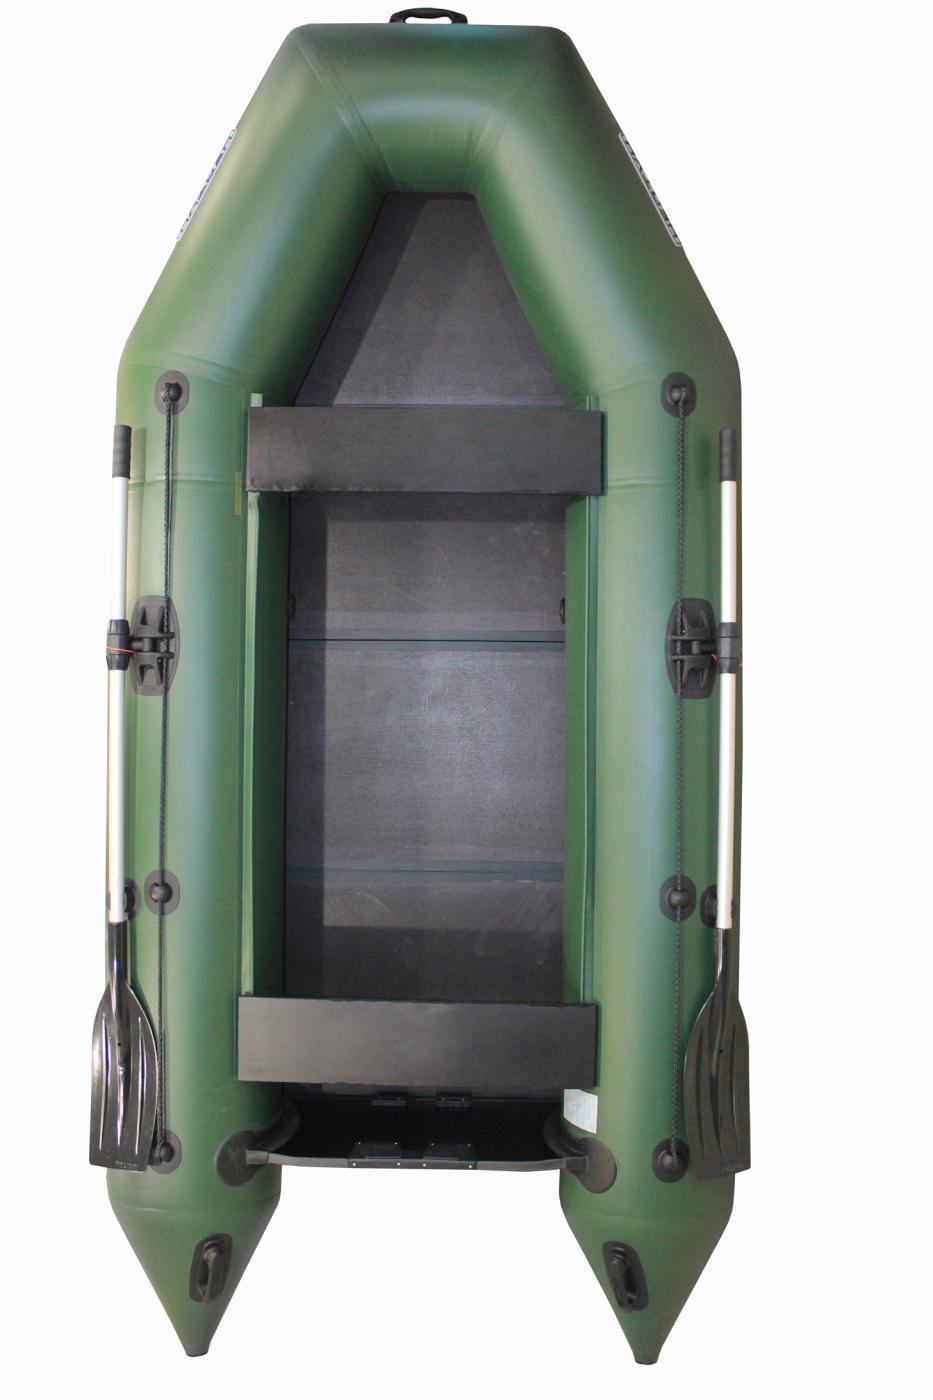 Надувная лодка Нептун КМ 280 зеленая (коврик-книжка) PRO